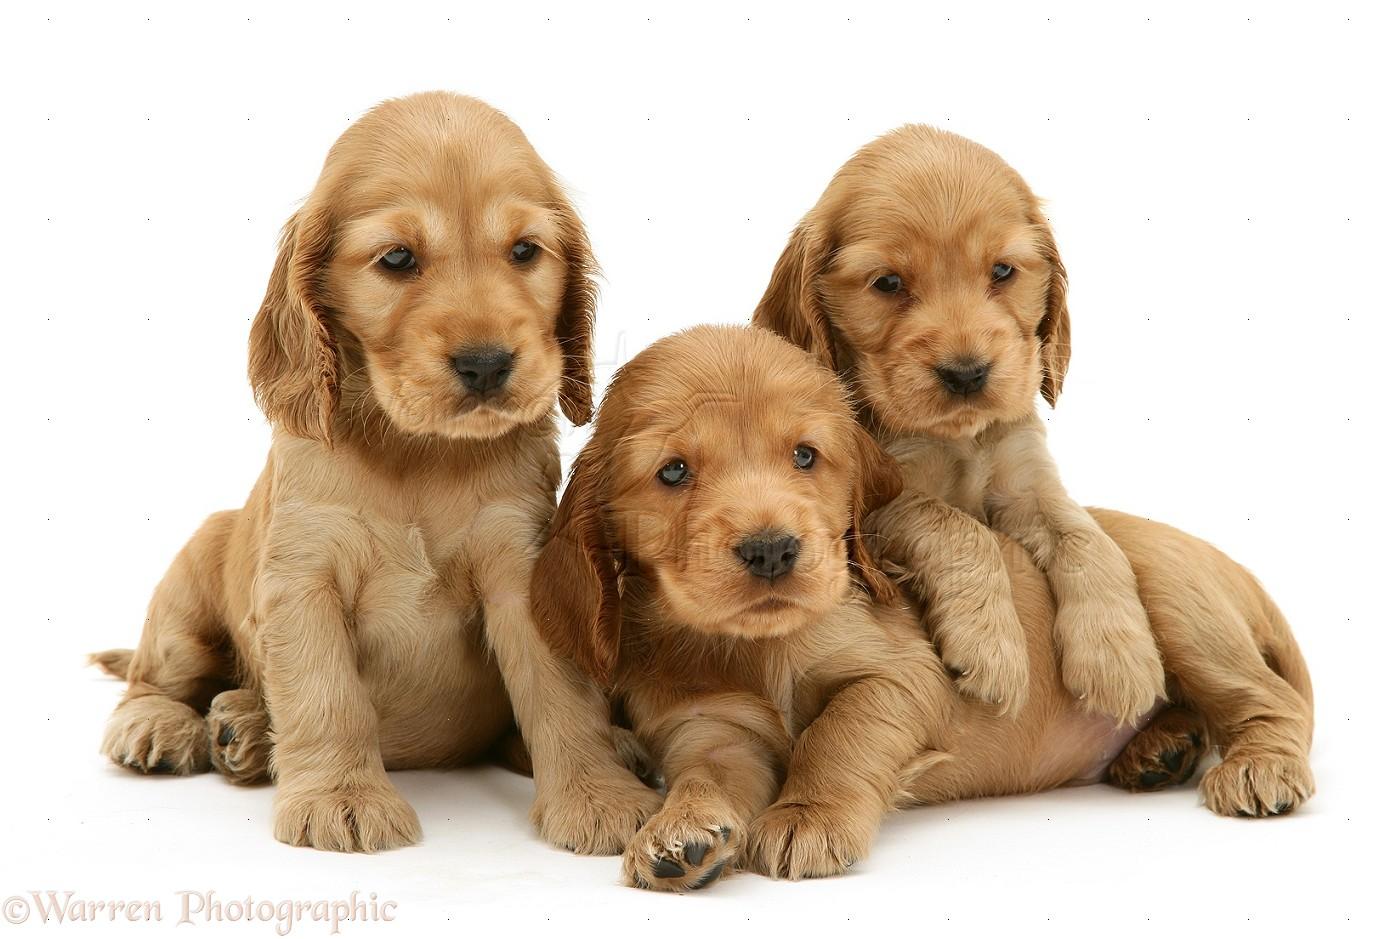 Dogs Three Golden Cocker Spaniel Pups Photo Wp10104